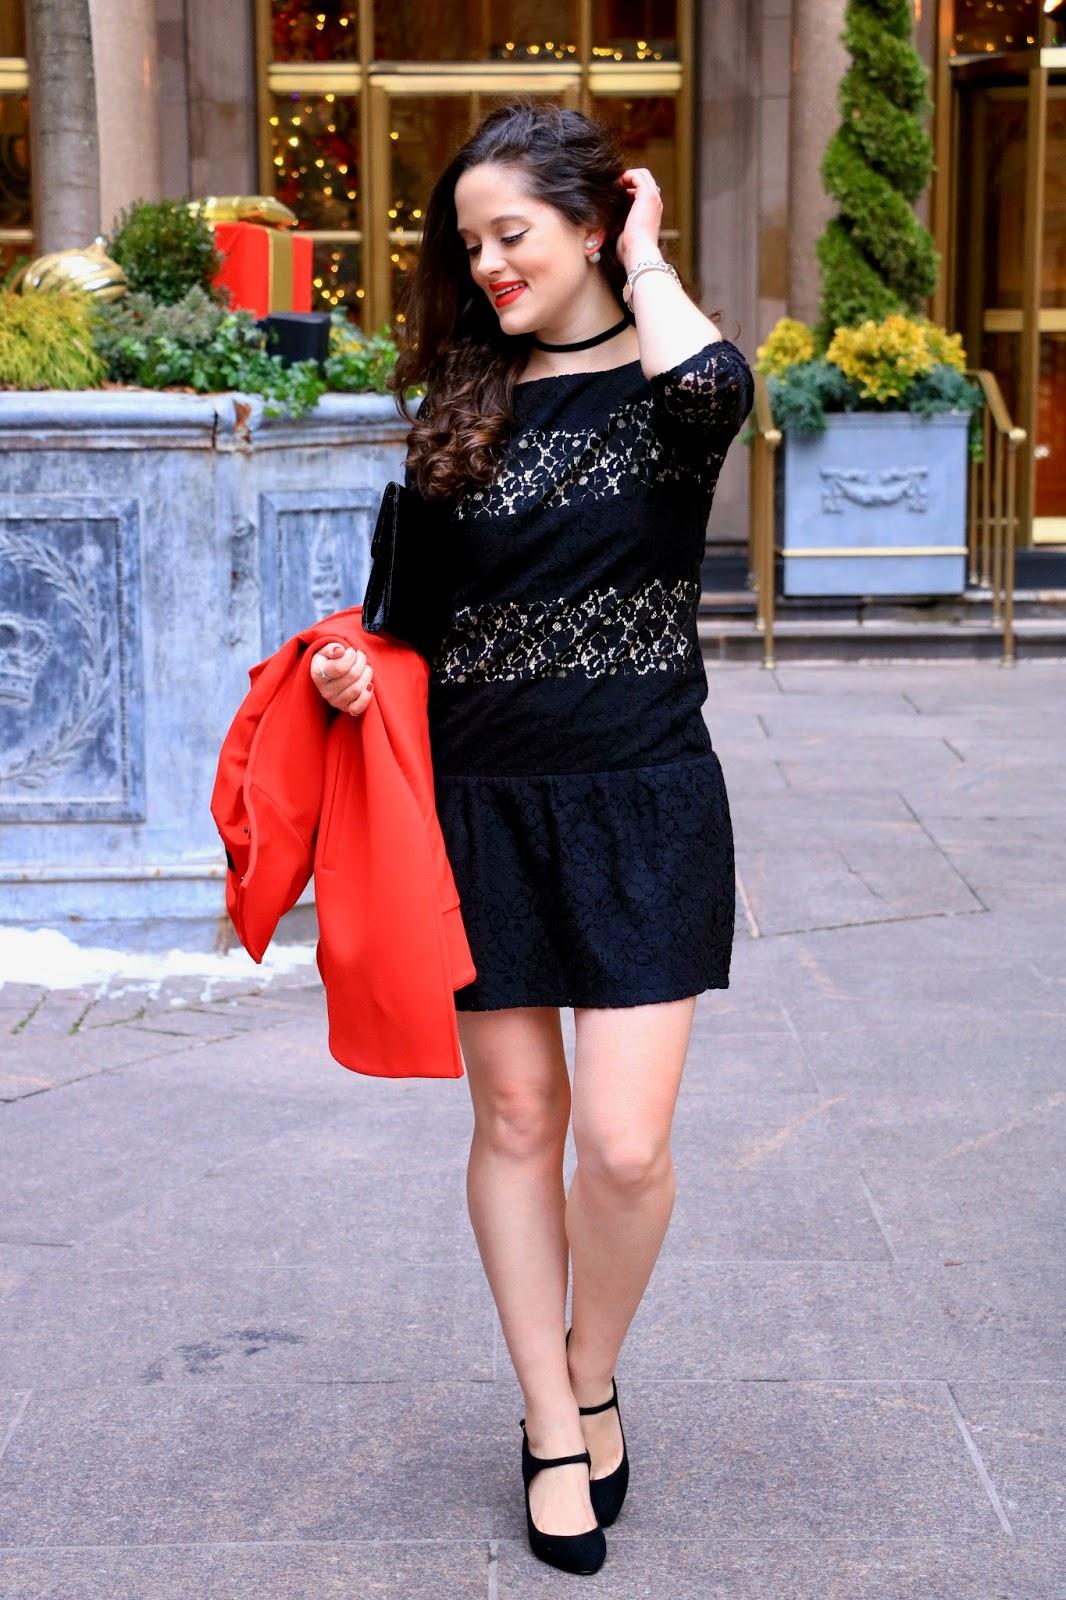 nyc holiday street style pics